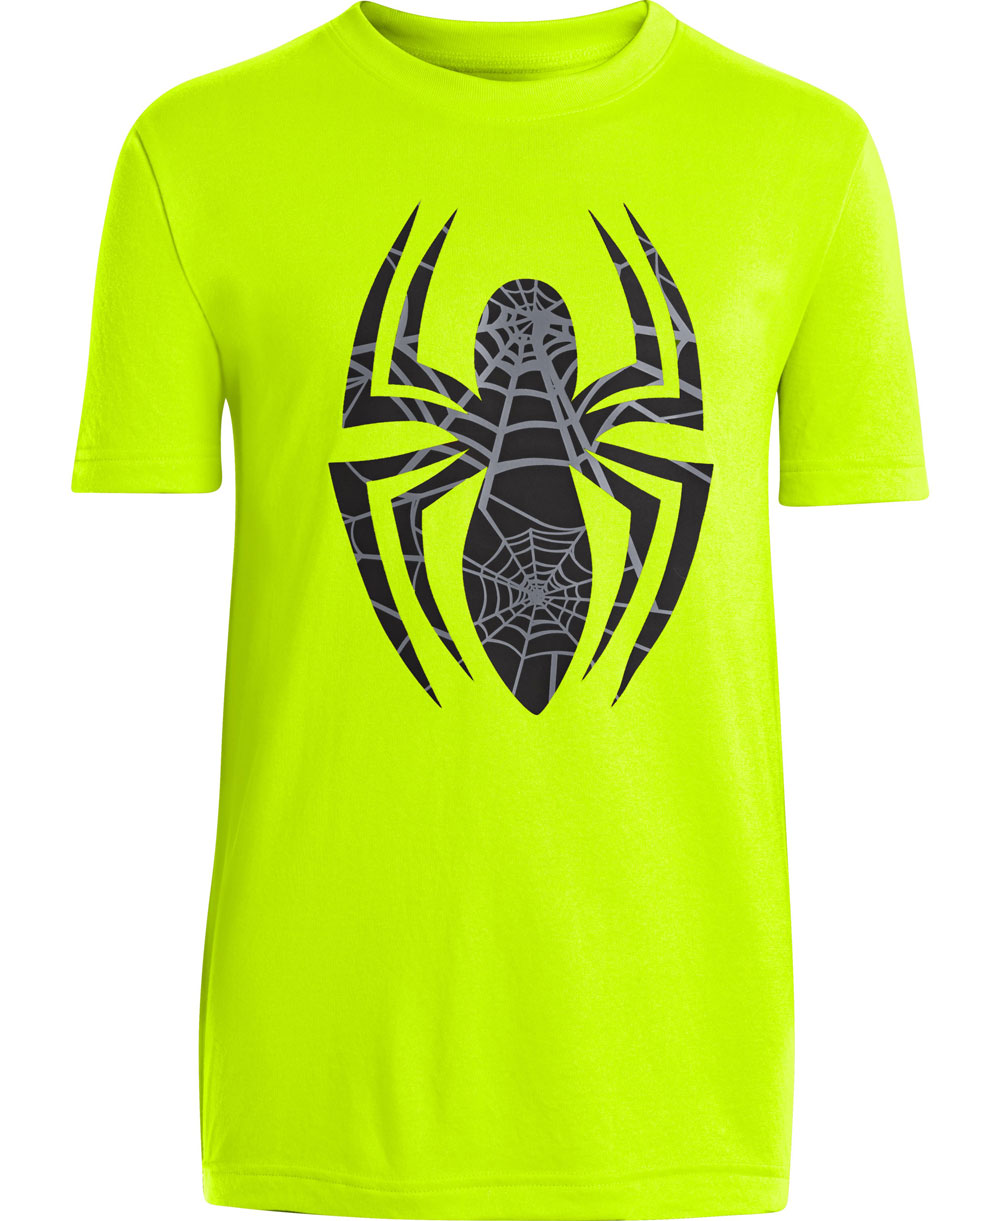 Kinder Kurzarm T-Shirt Alter Ego Spider-man